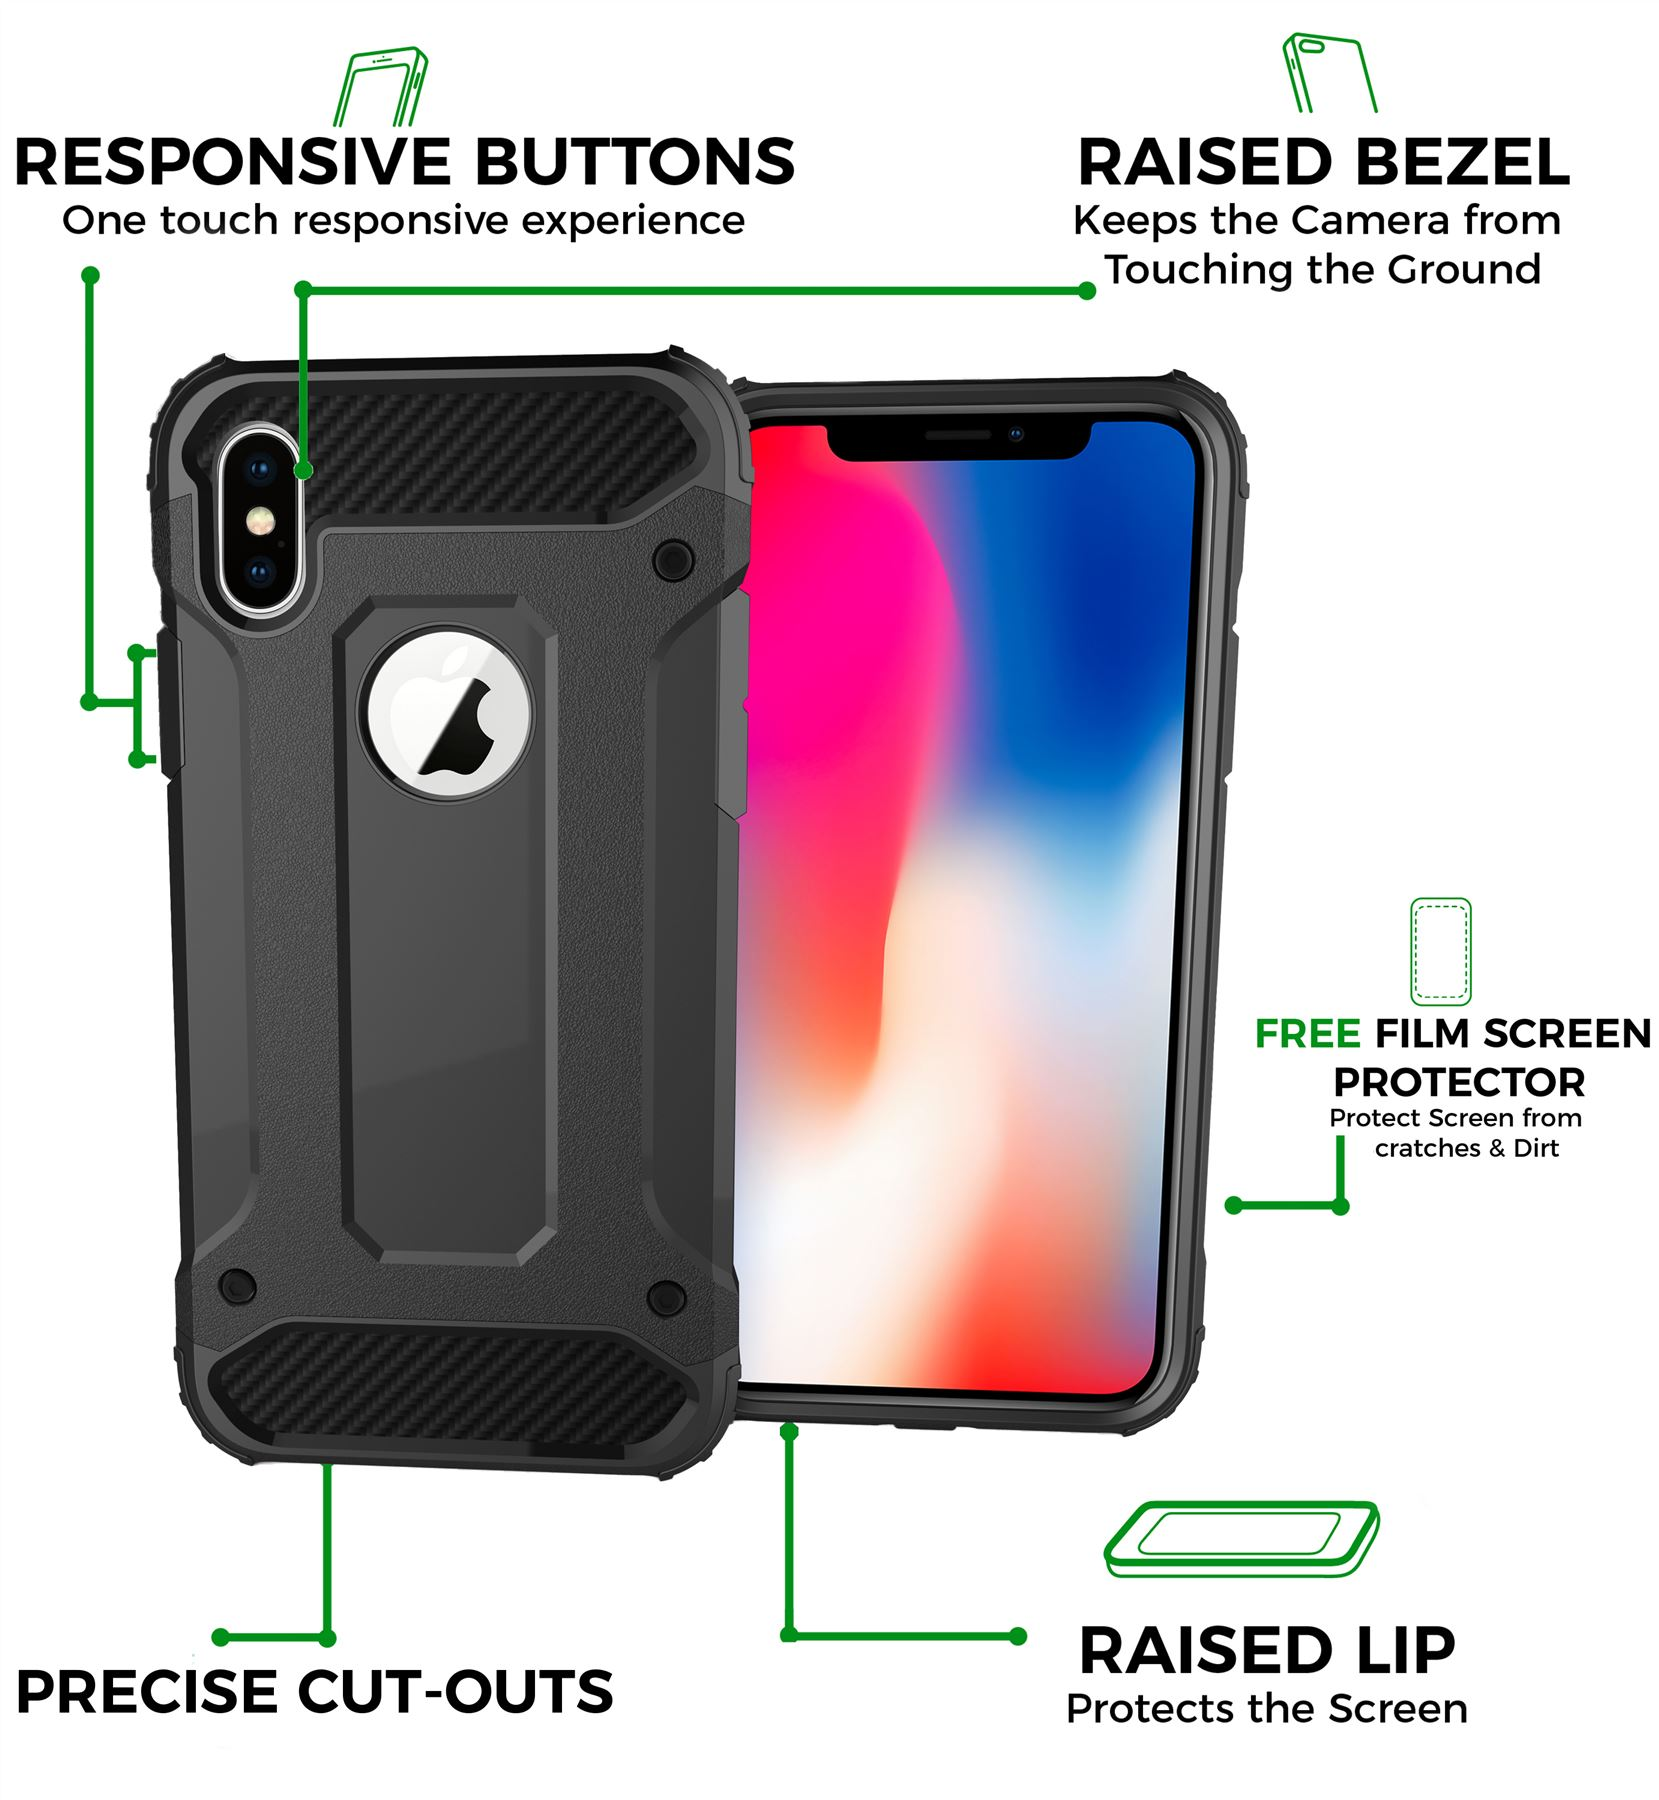 thumbnail 18 - For Apple iPhone 11 Pro Max XR Xs X 8 7 Plus 6 5 Se Case Cover Tough Armor